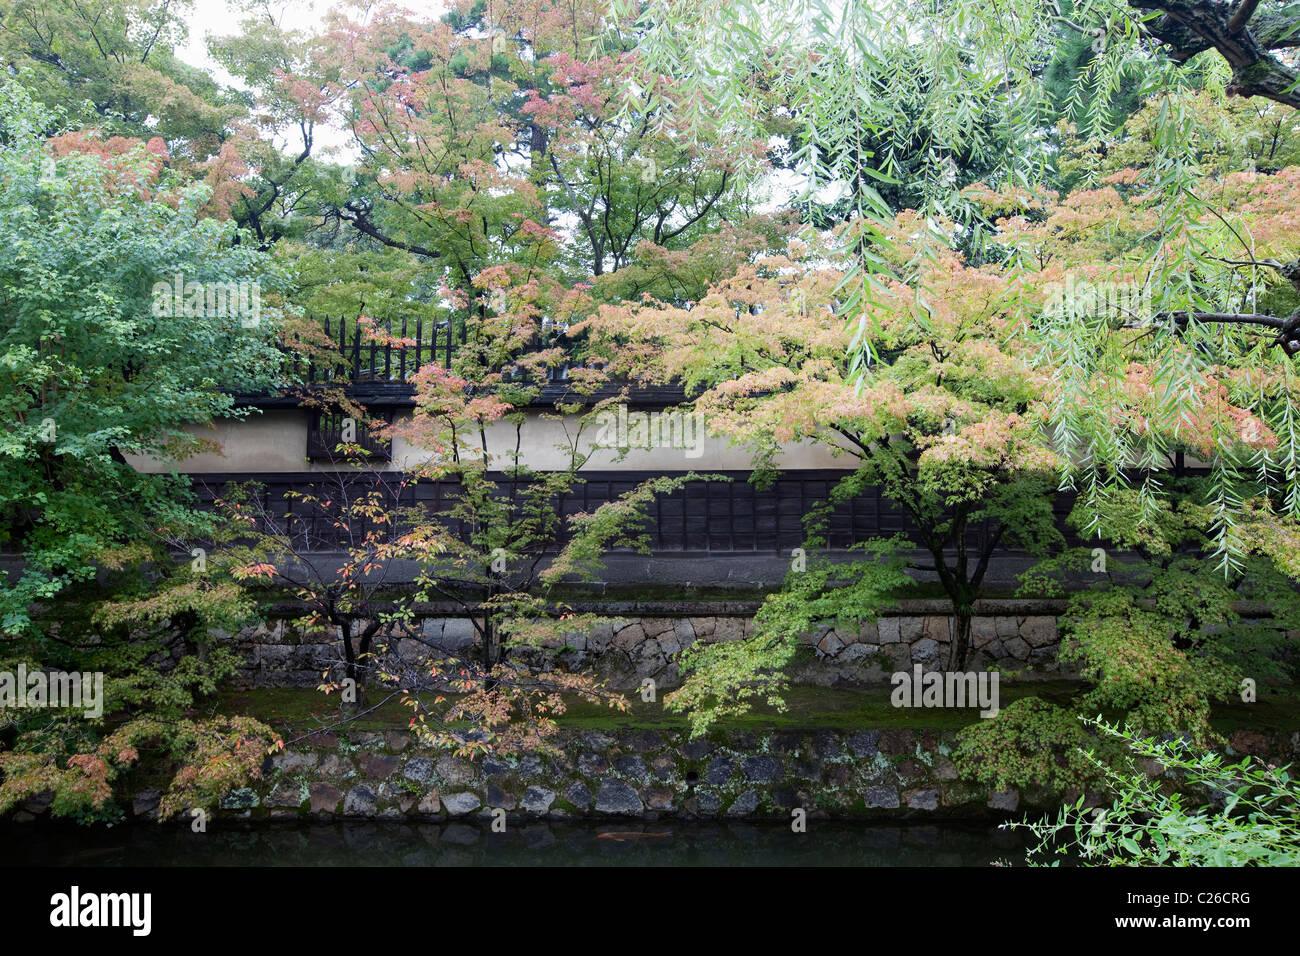 Black Willow Tree Stock Photos & Black Willow Tree Stock Images - Alamy